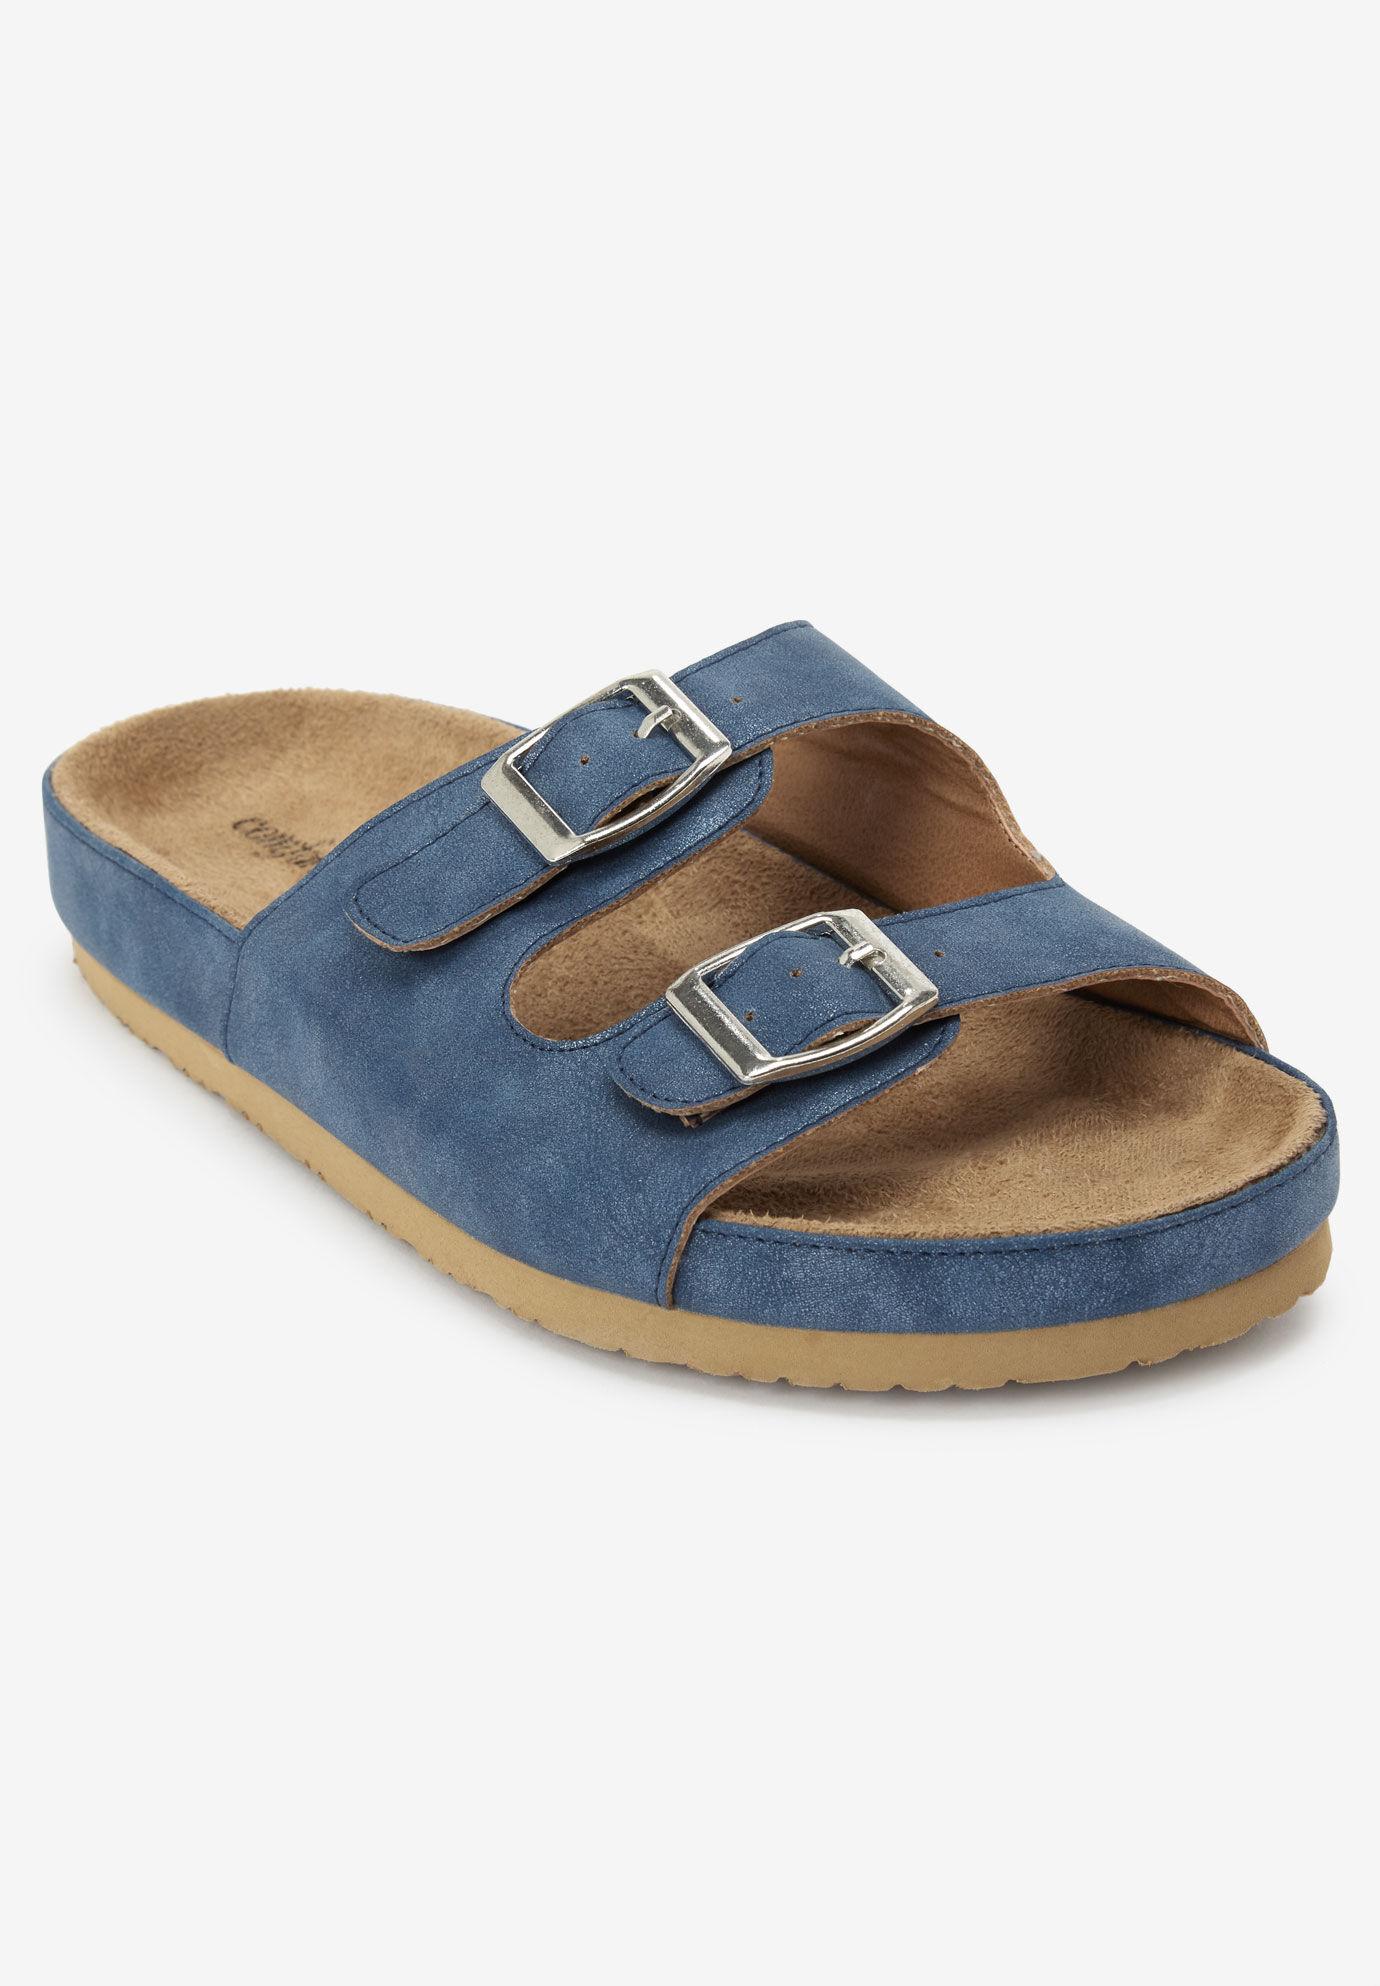 Shop for Wide Width Sport Sandals for